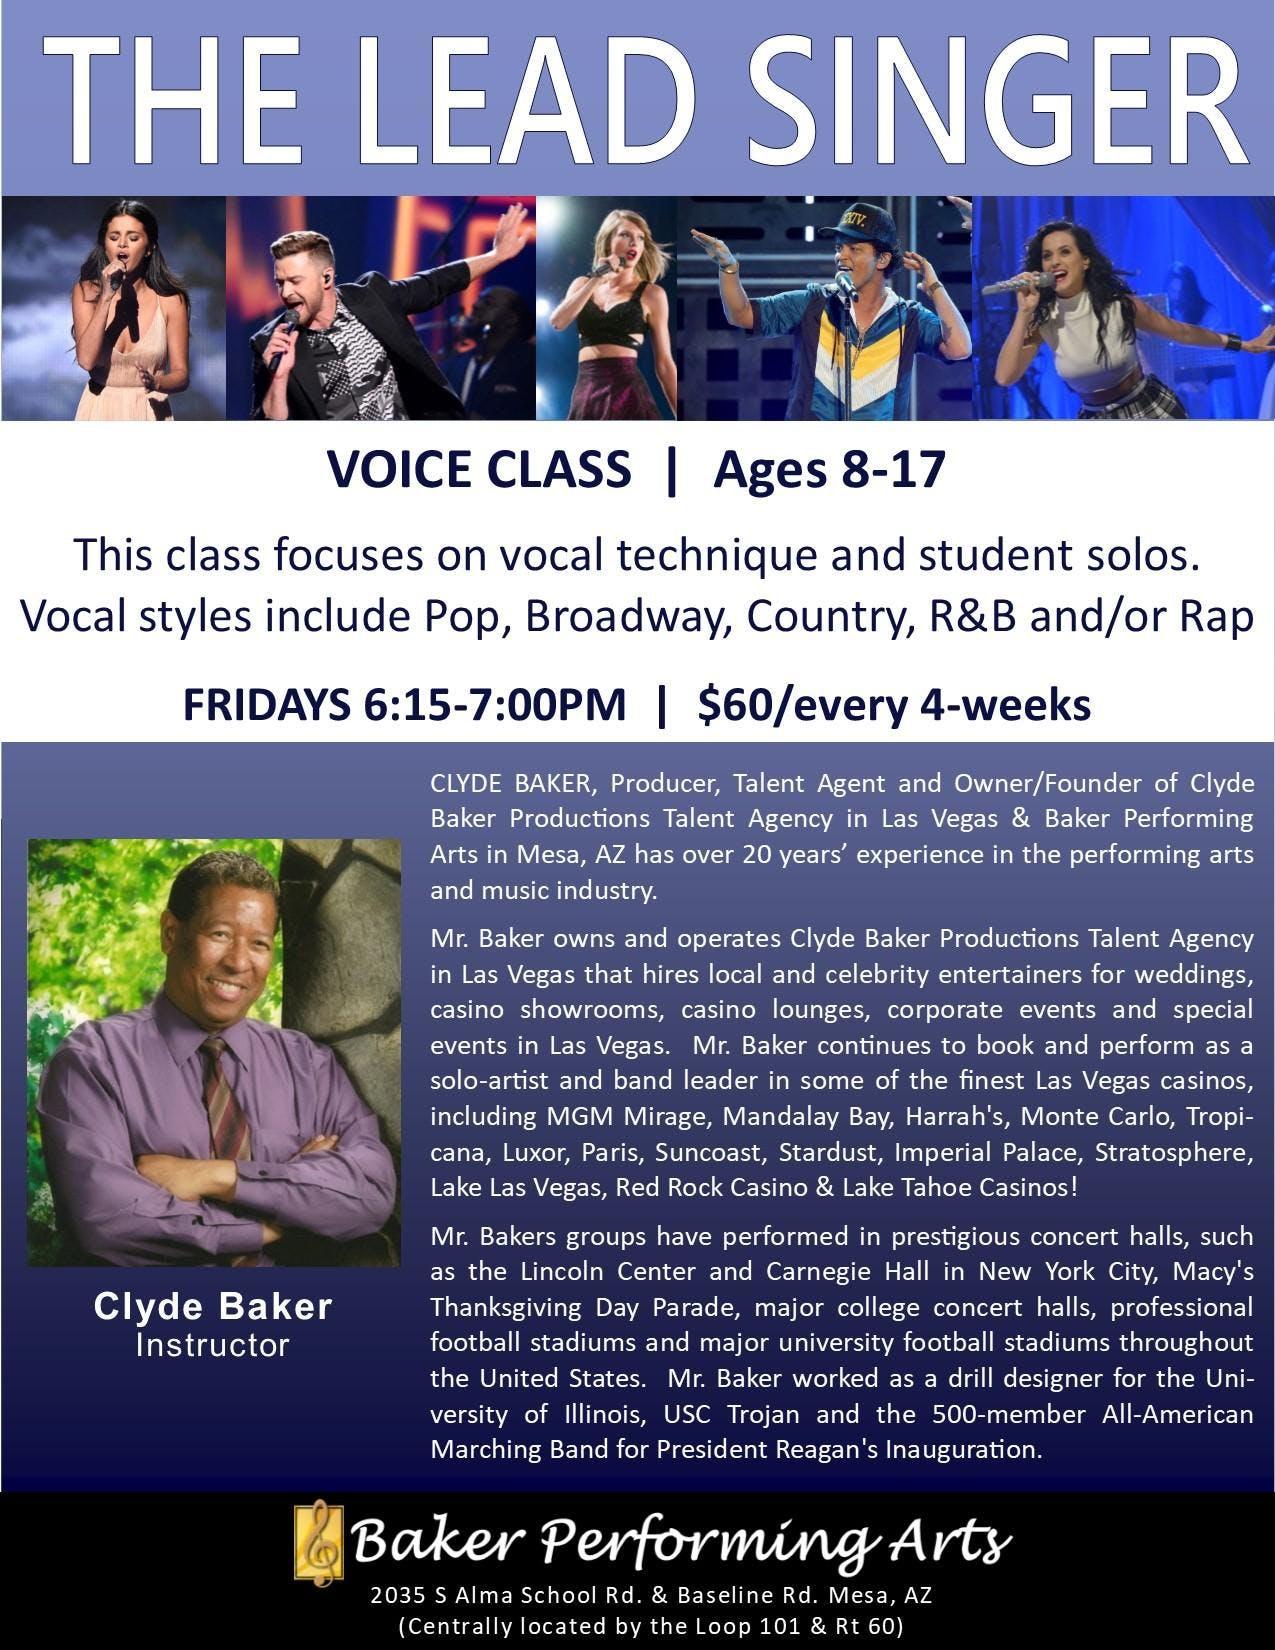 The Lead Singer Voice Class